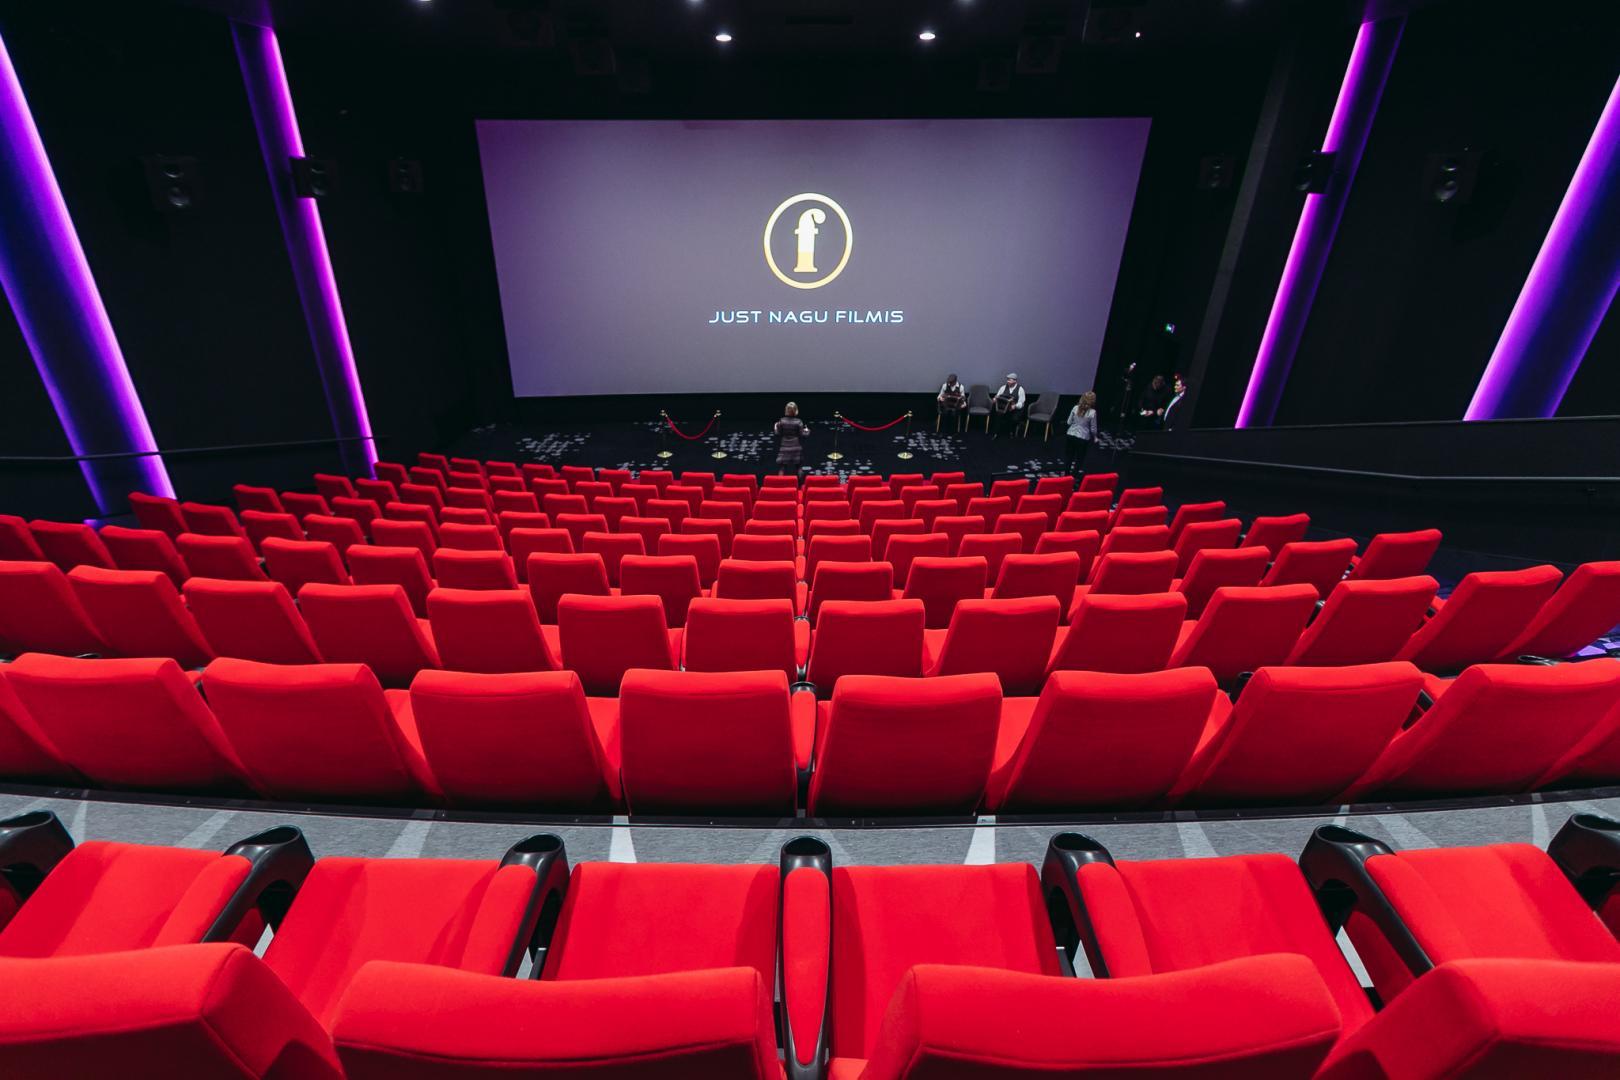 Coca-Cola Plaza Cinema venue image